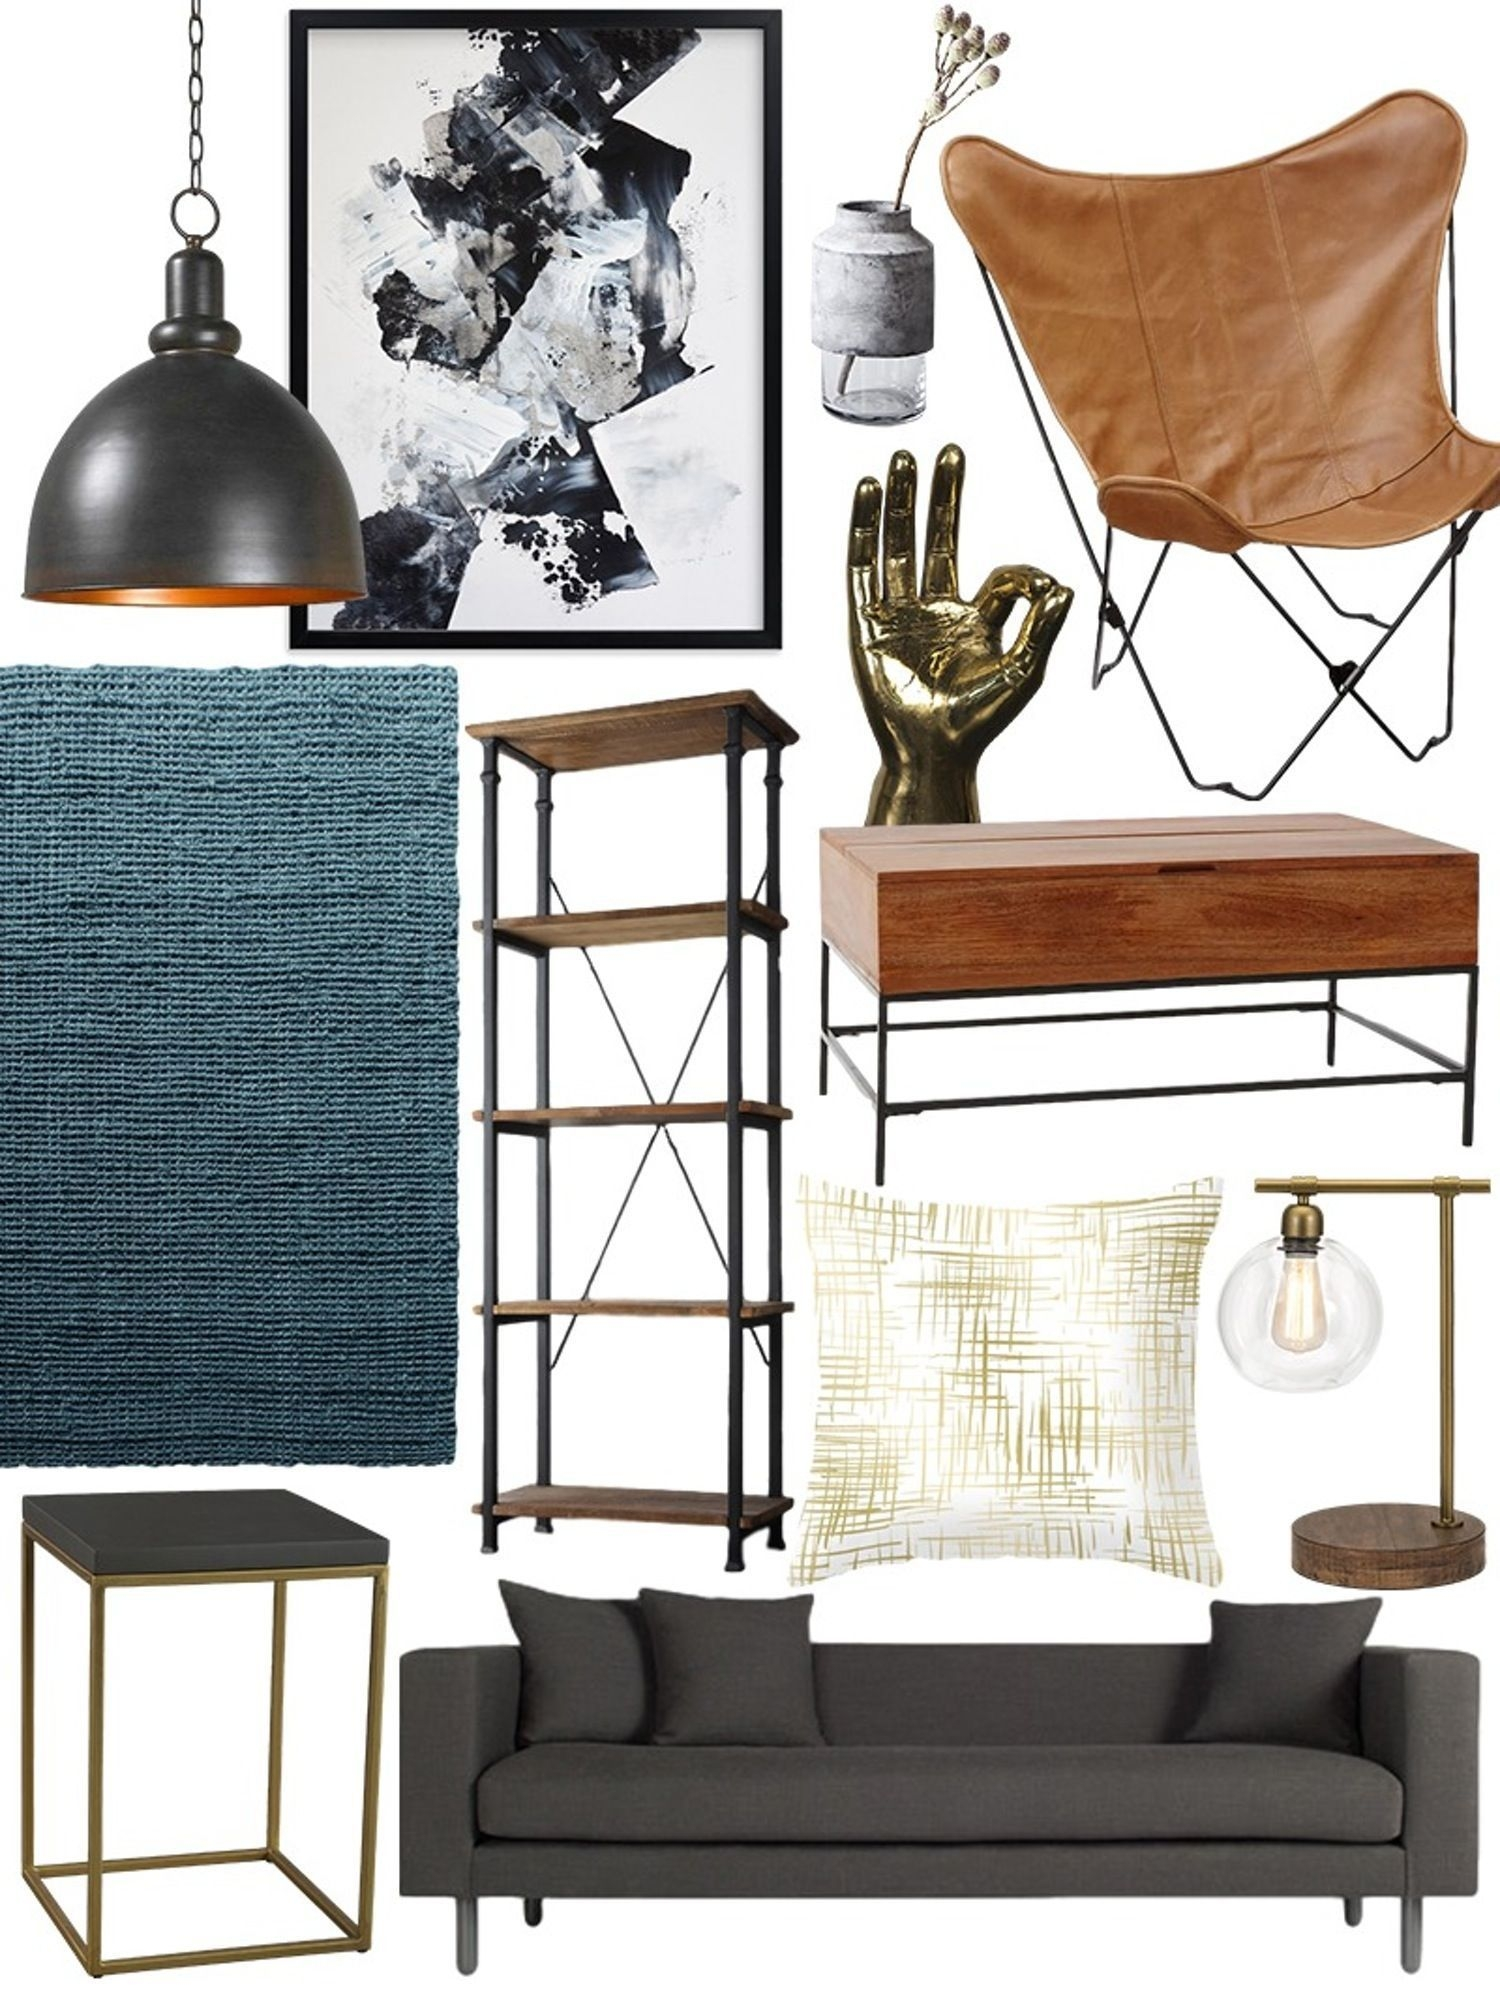 Creative Industrial Living Room Designs Ideas10